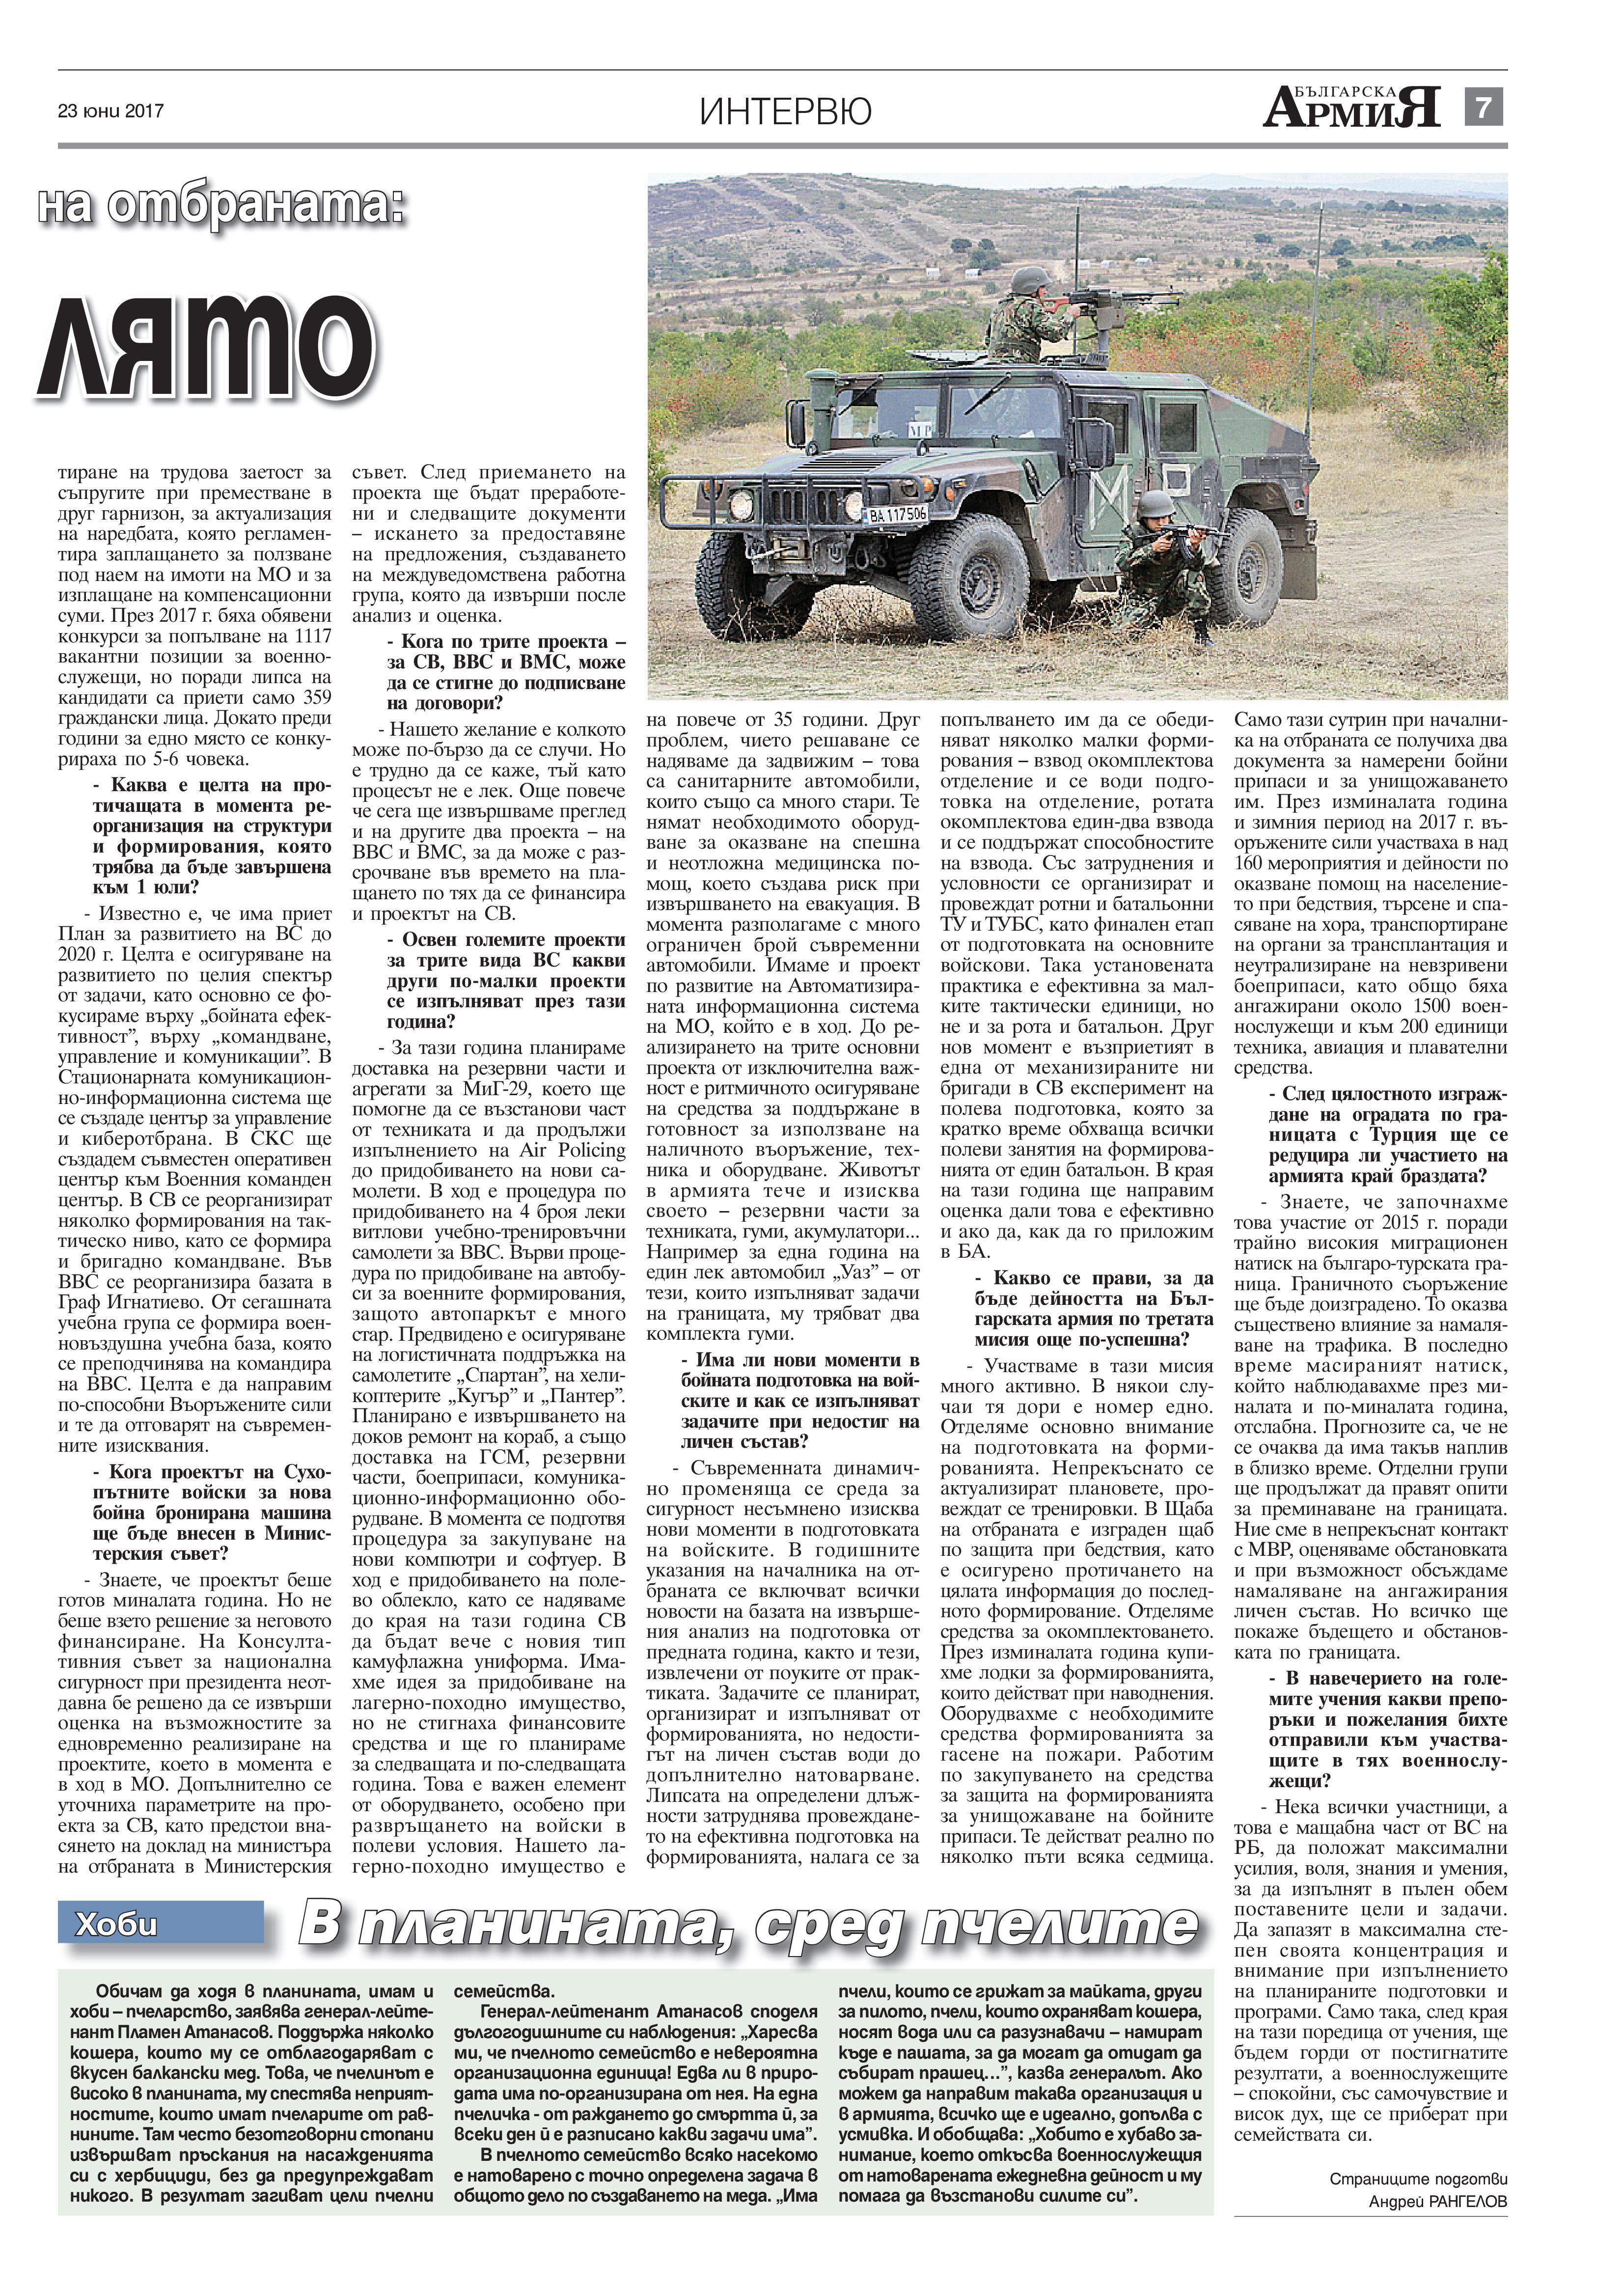 https://www.armymedia.bg/wp-content/uploads/2017/06/07.jpg